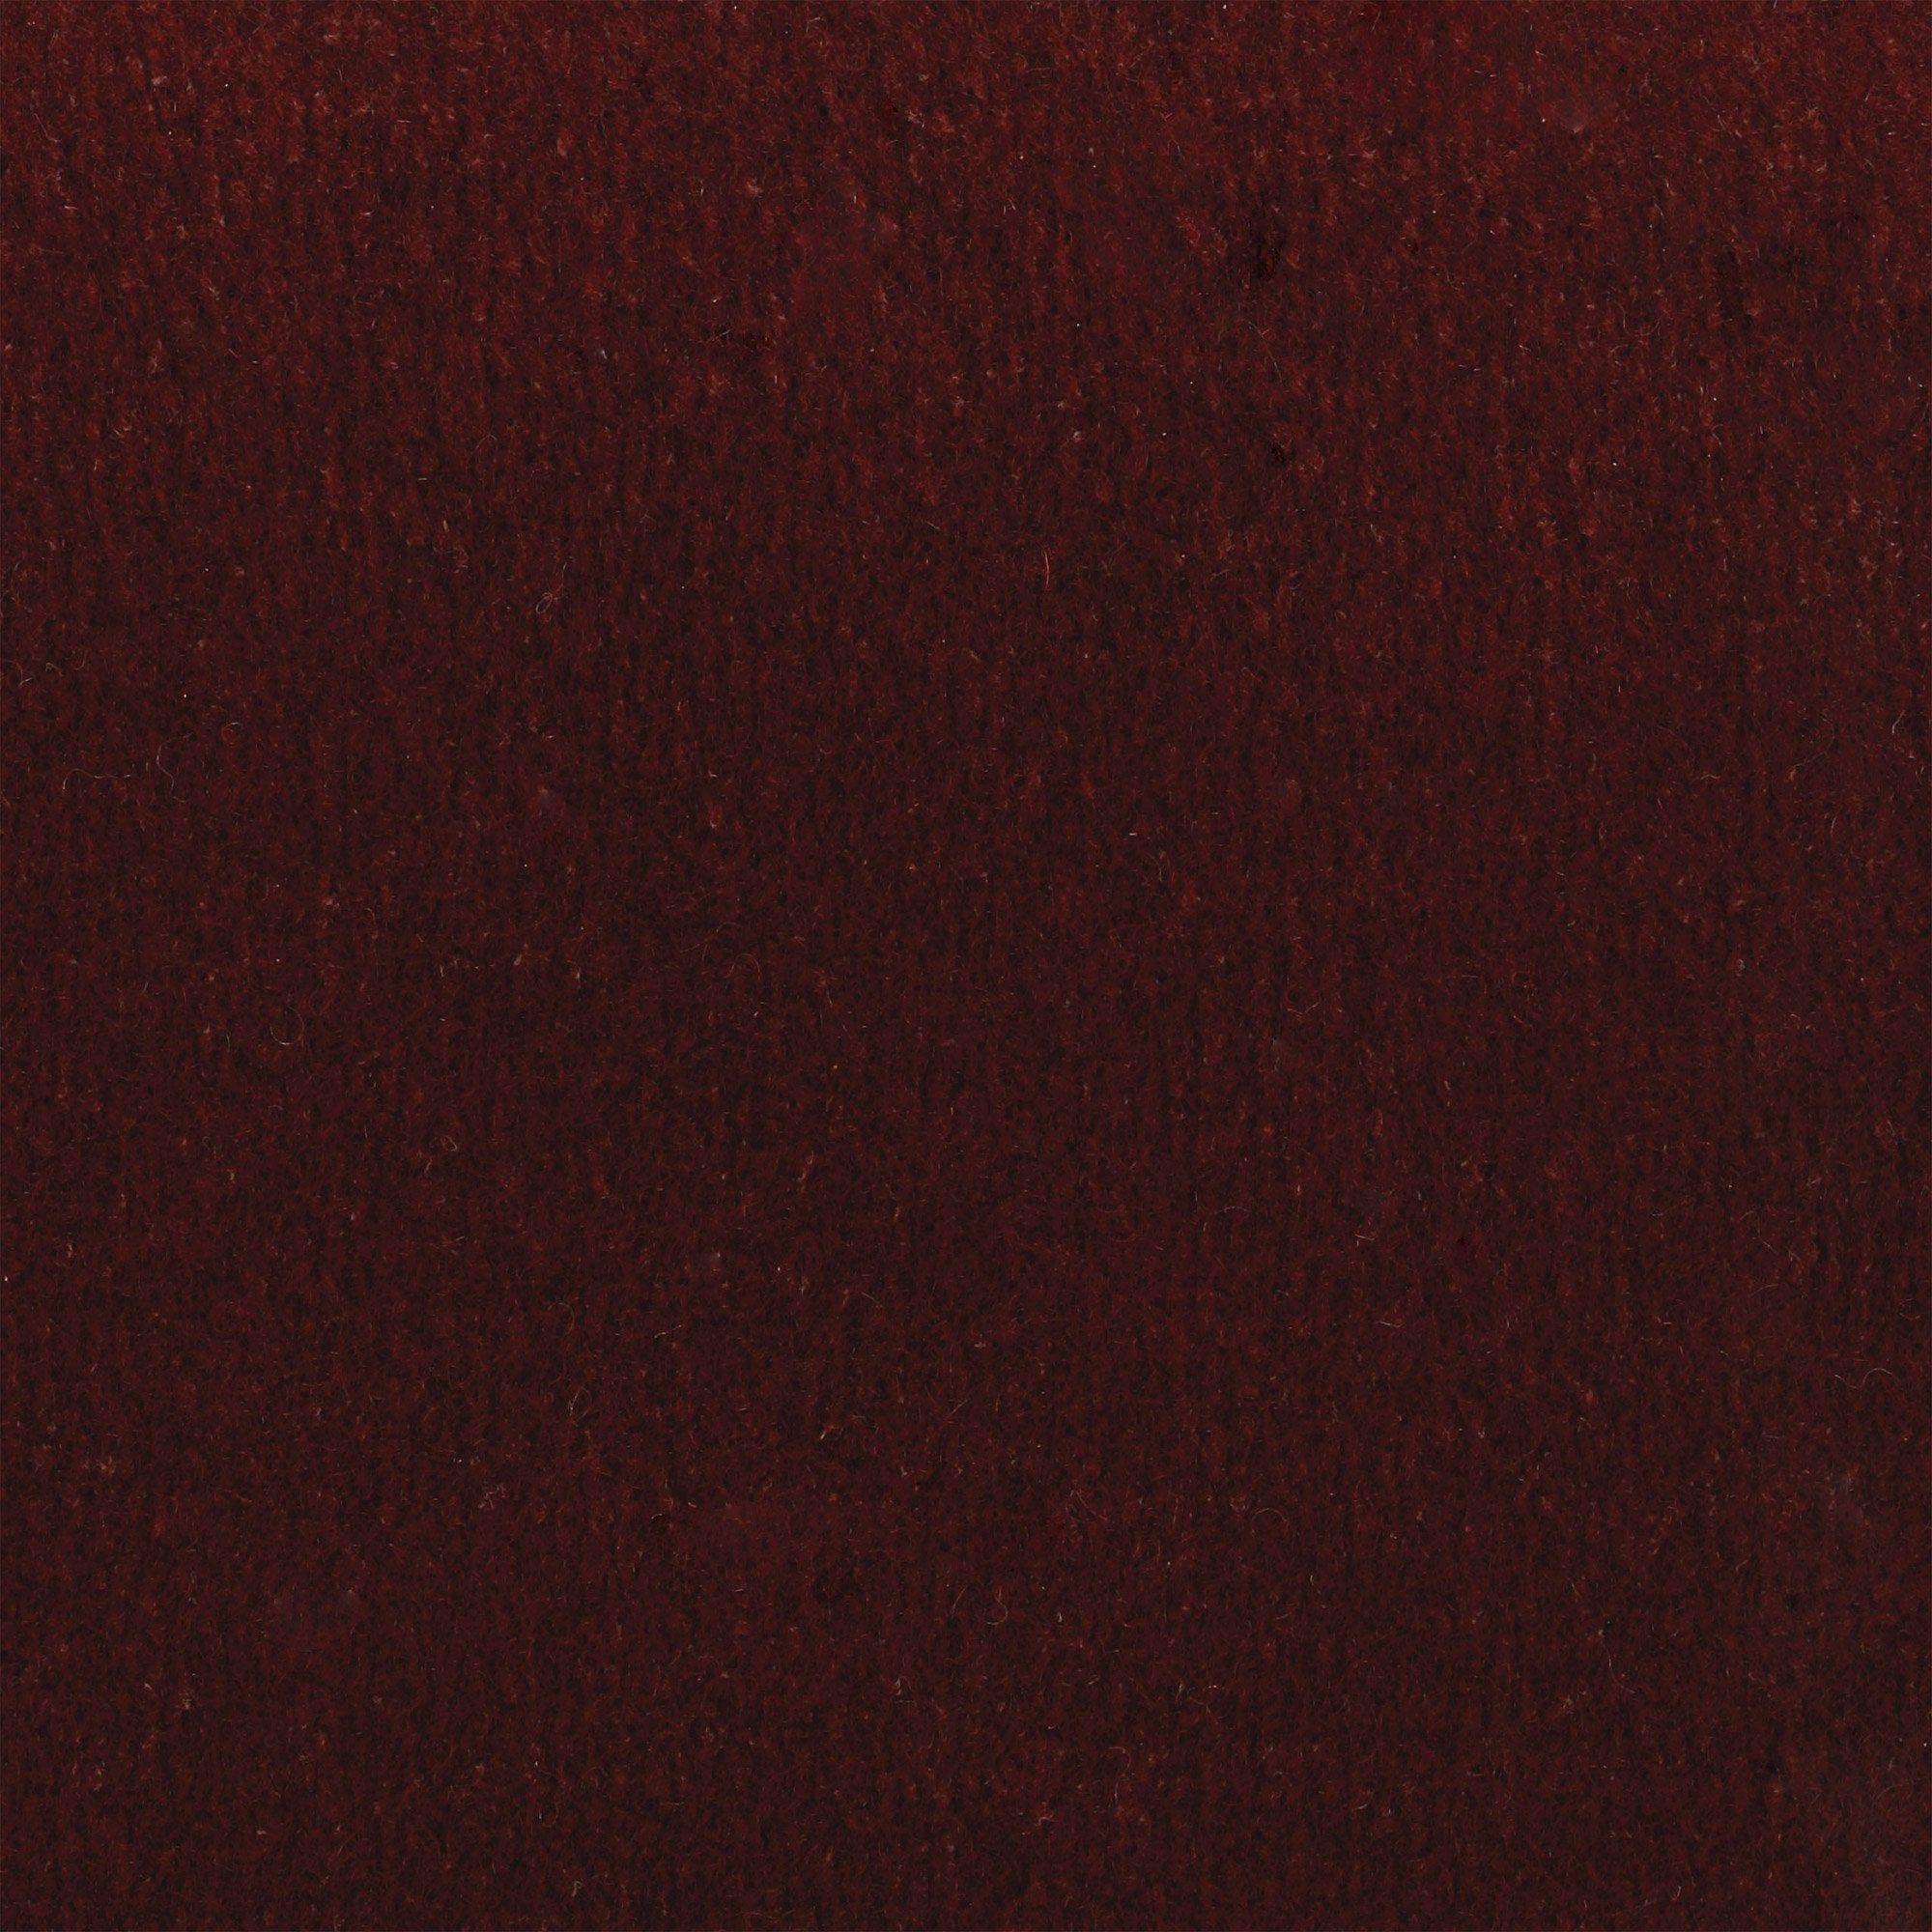 Moquette Laine Ancy Rouge Capucin Moquette Dalle Moquette Sol Vinyle